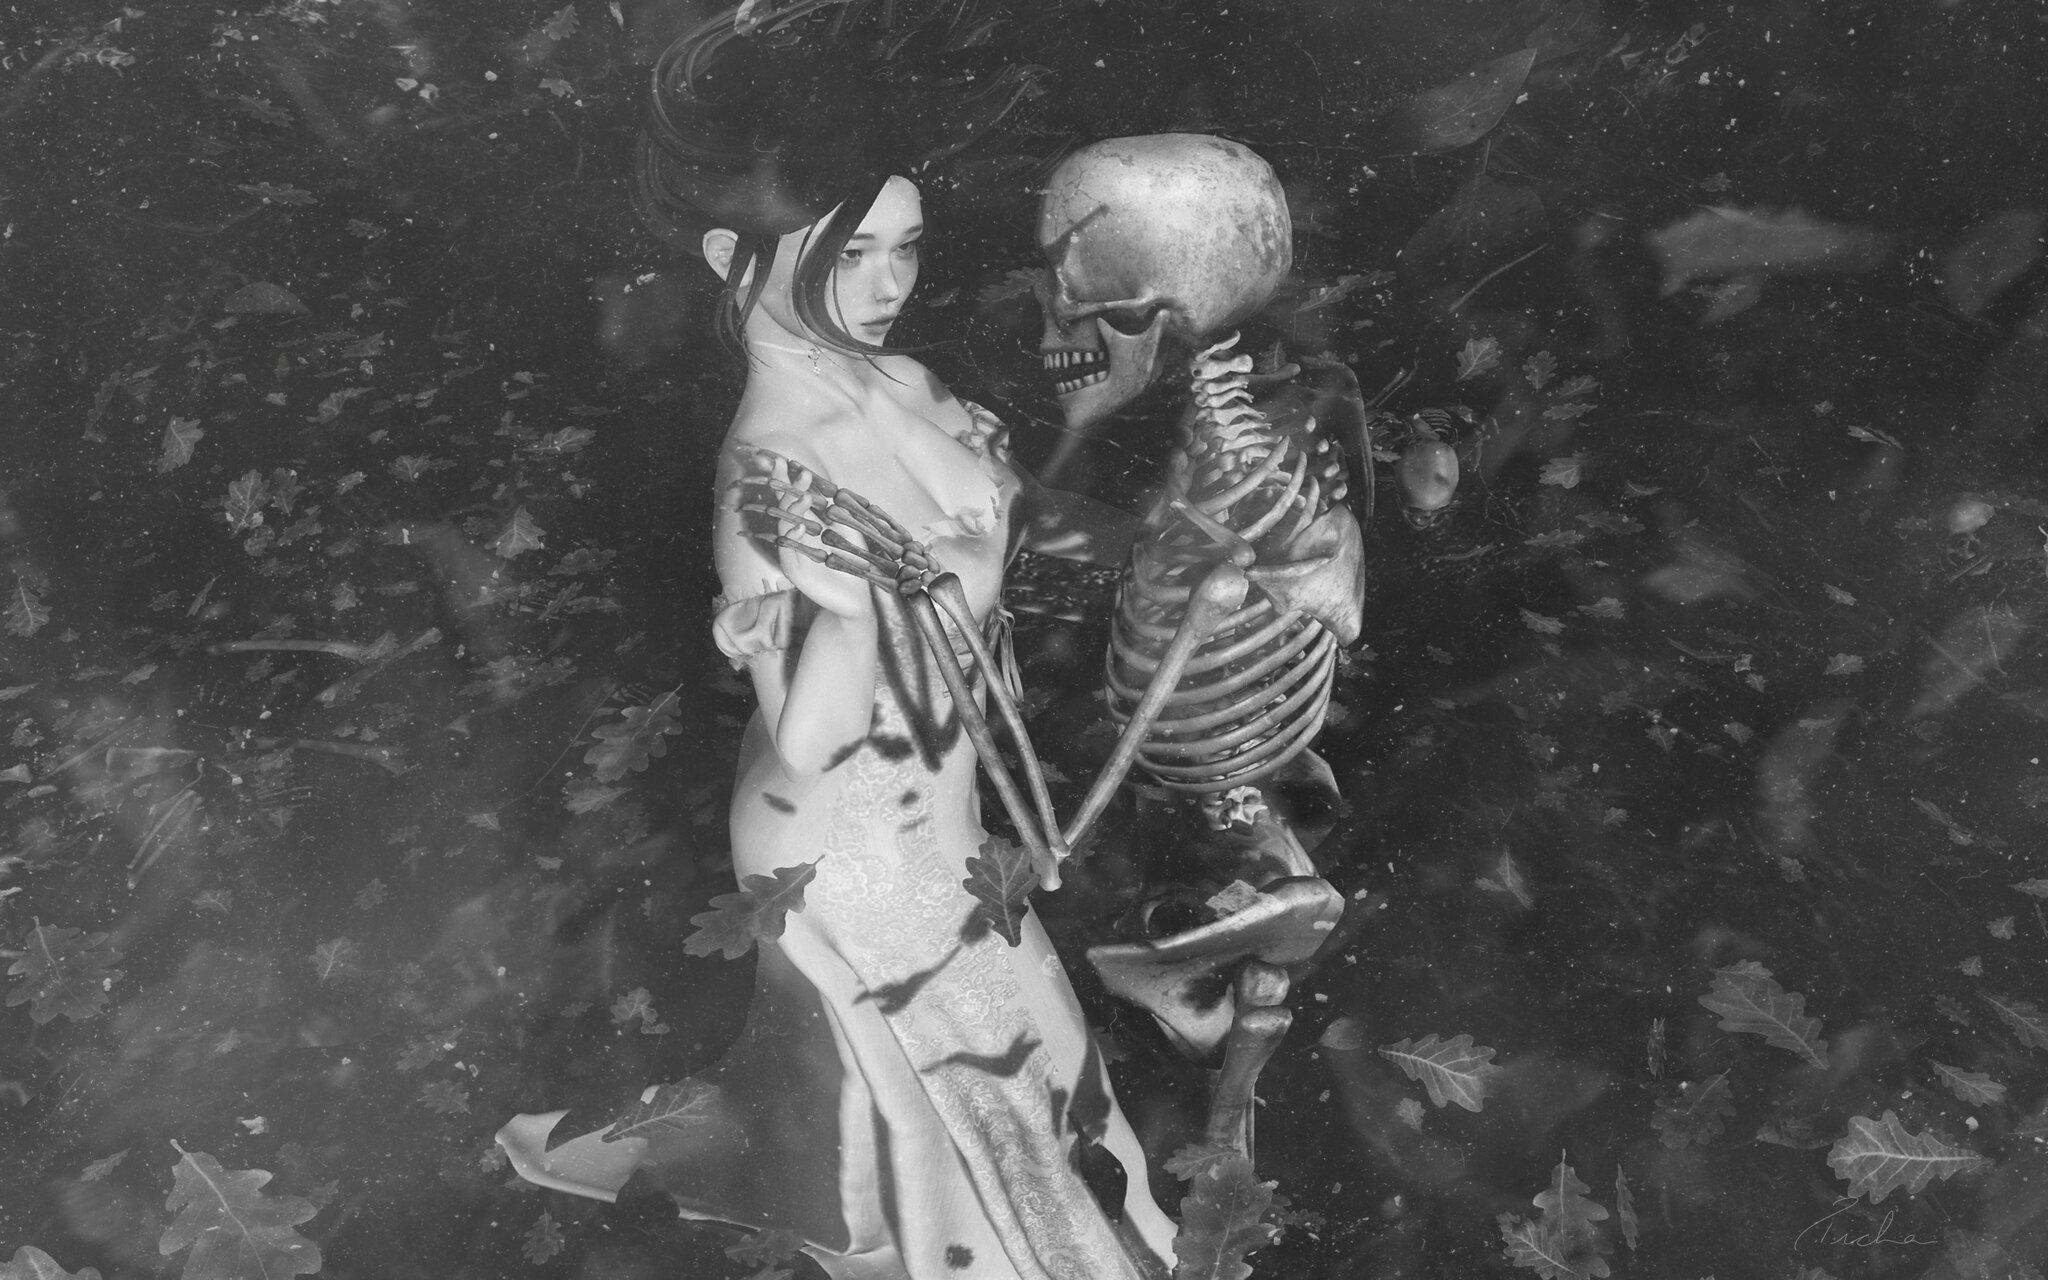 Valse macabre